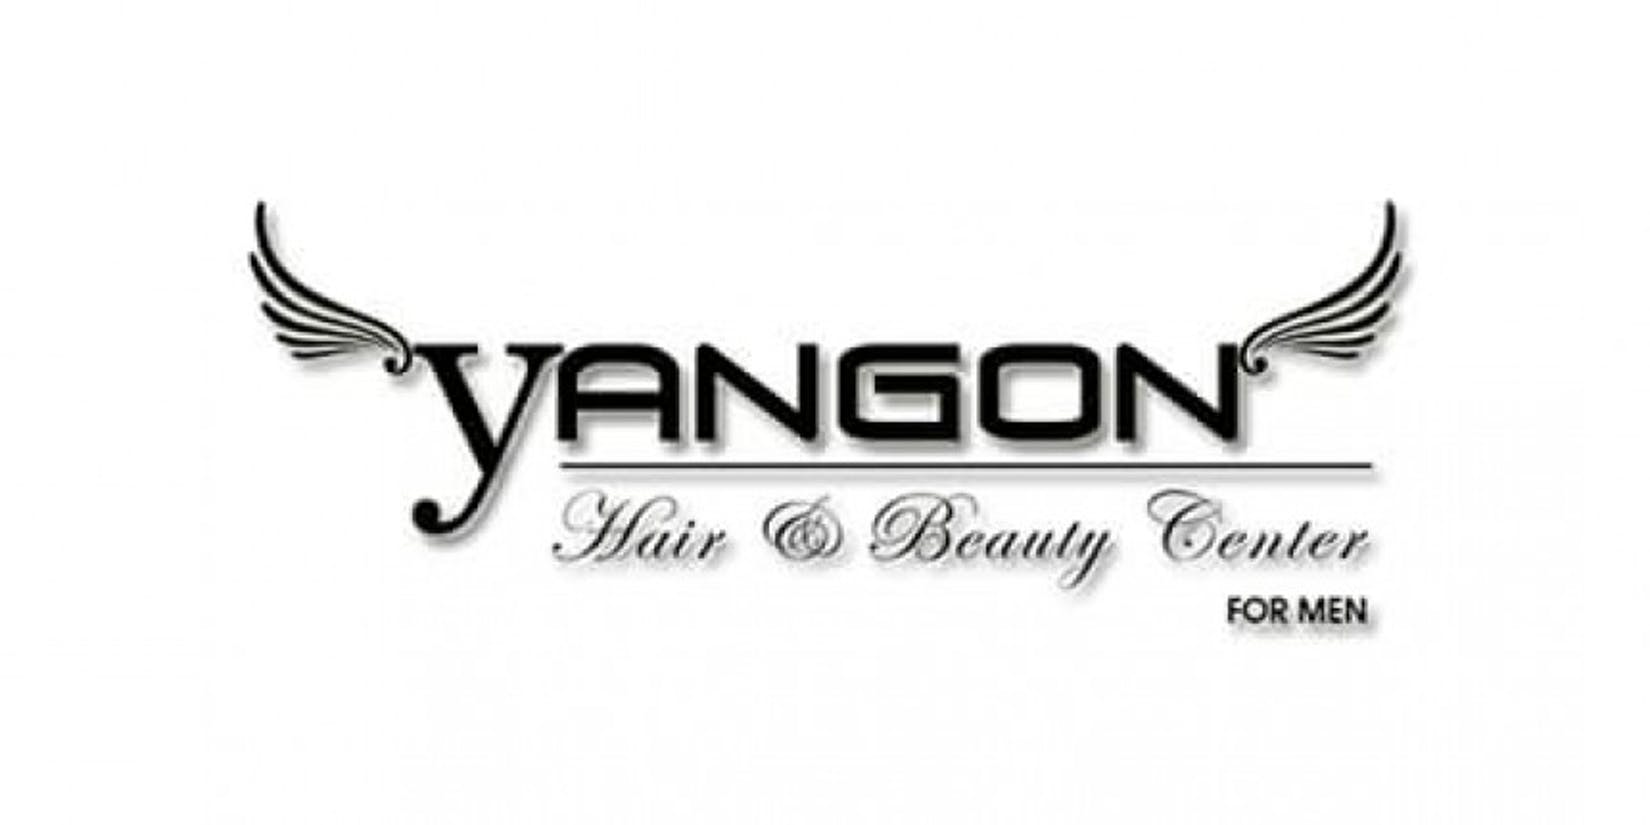 Yangon Hair & Beauty Center | Beauty